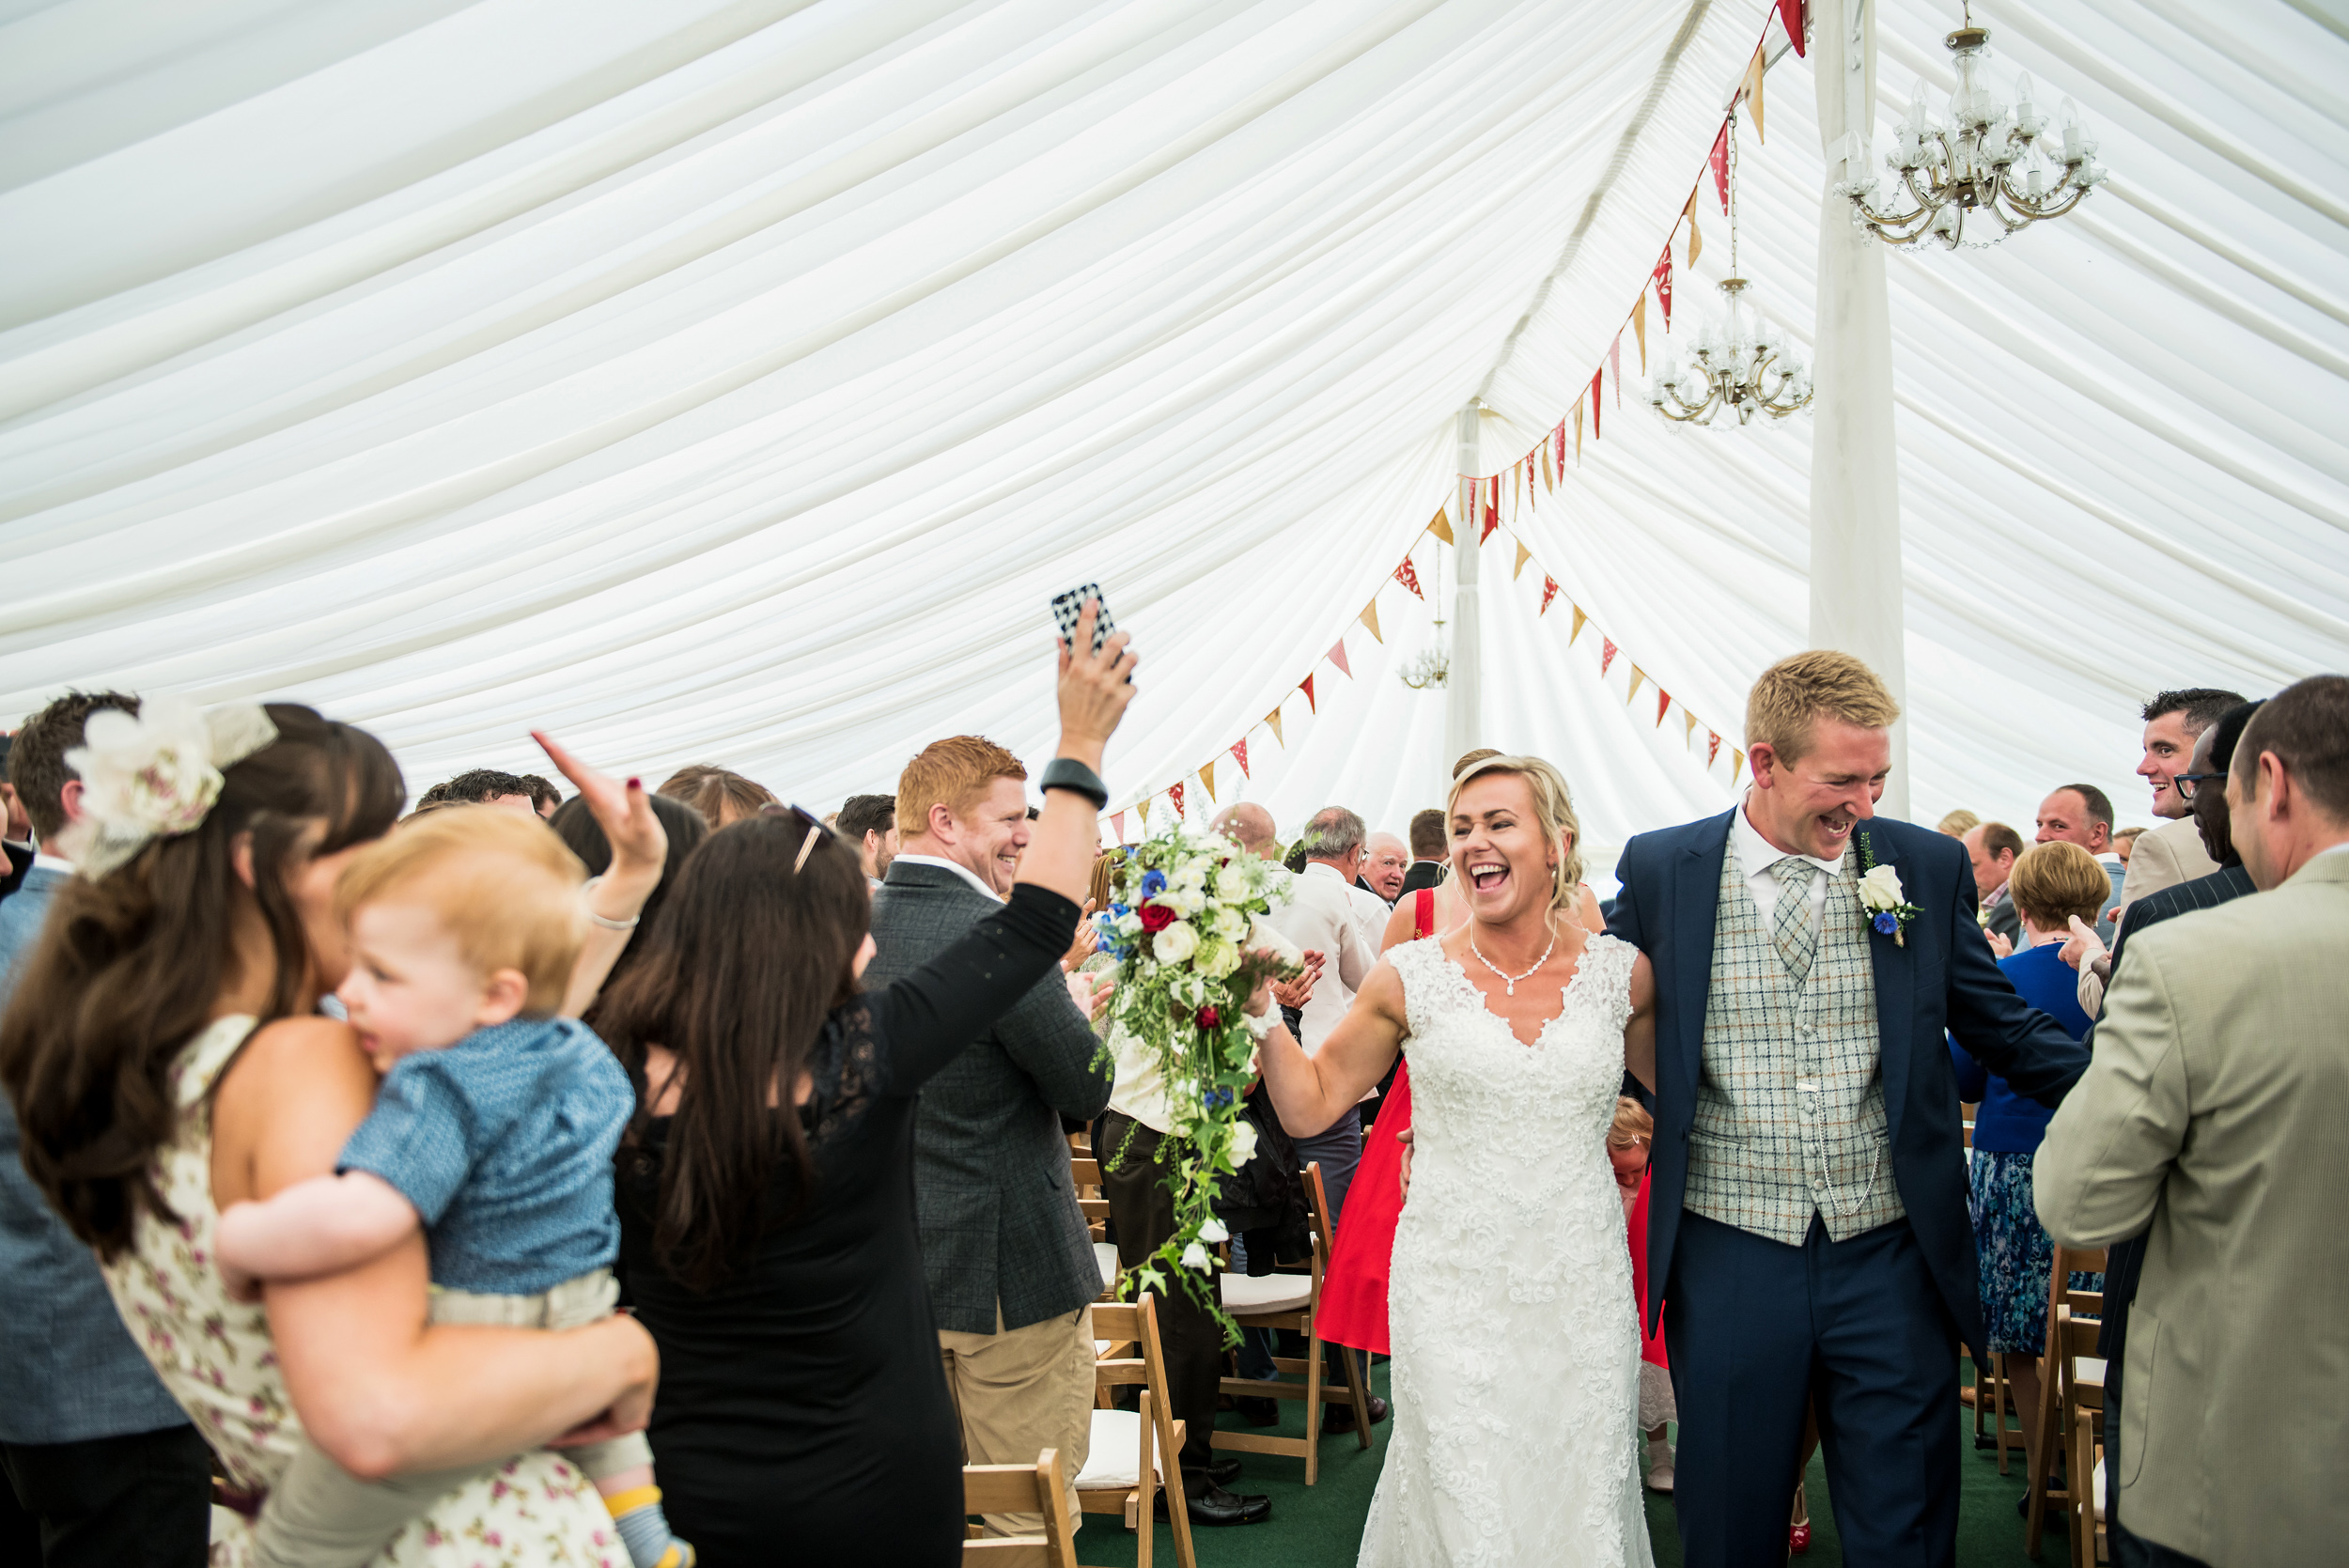 David Scholes Lancashire wedding photography 2016-112.jpg